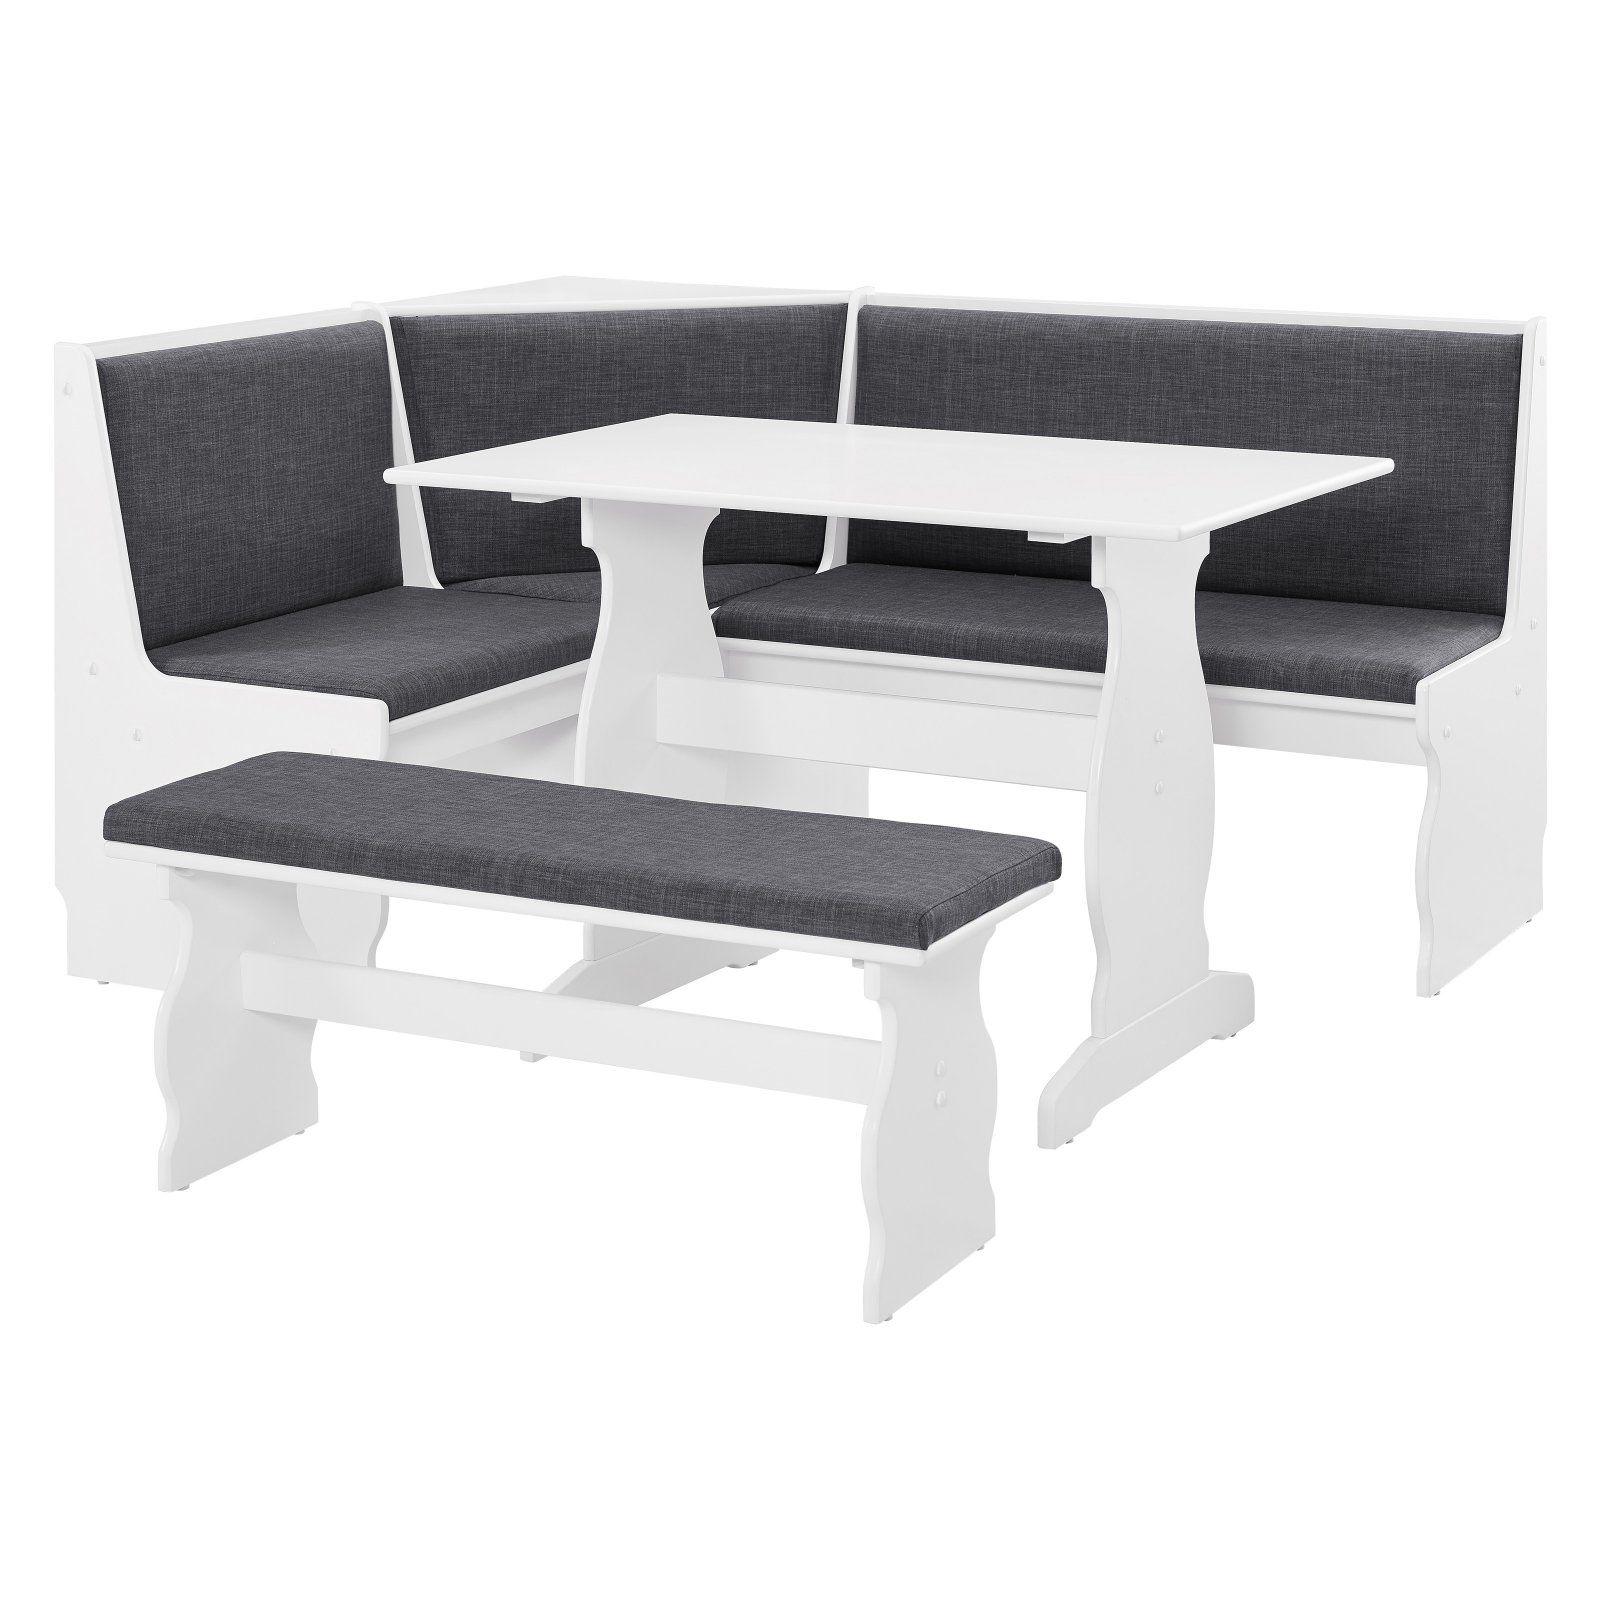 Linon Sasha Nook Charcoal And White Includes Corner Unit Table And Bench Walmart Com Nook Dining Set Breakfast Nook Dining Set Dining Nook